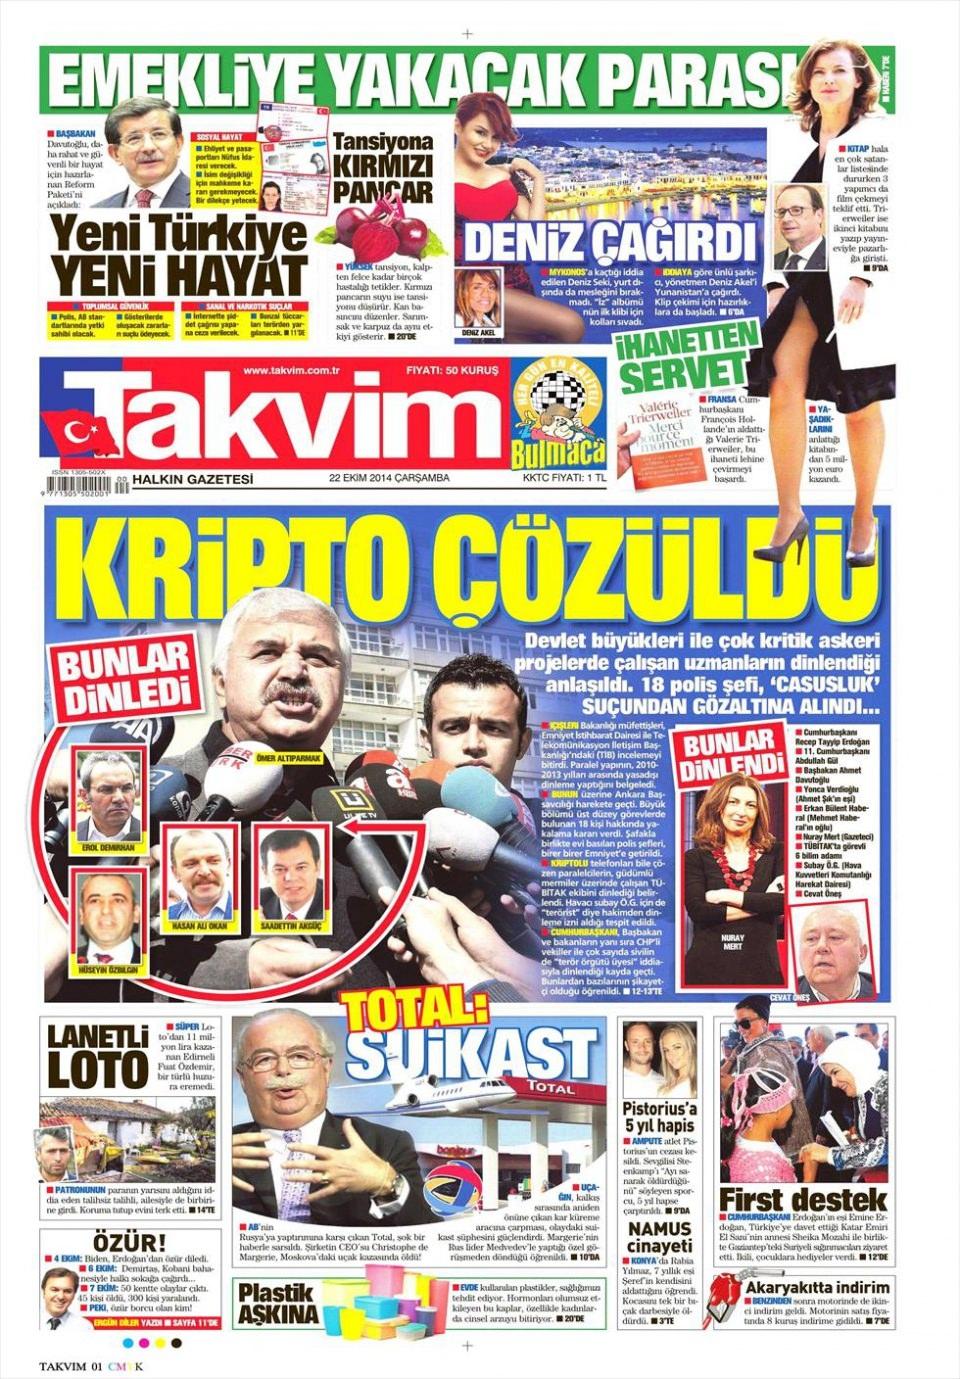 22 Ekim 2014 gazete manşetleri 18